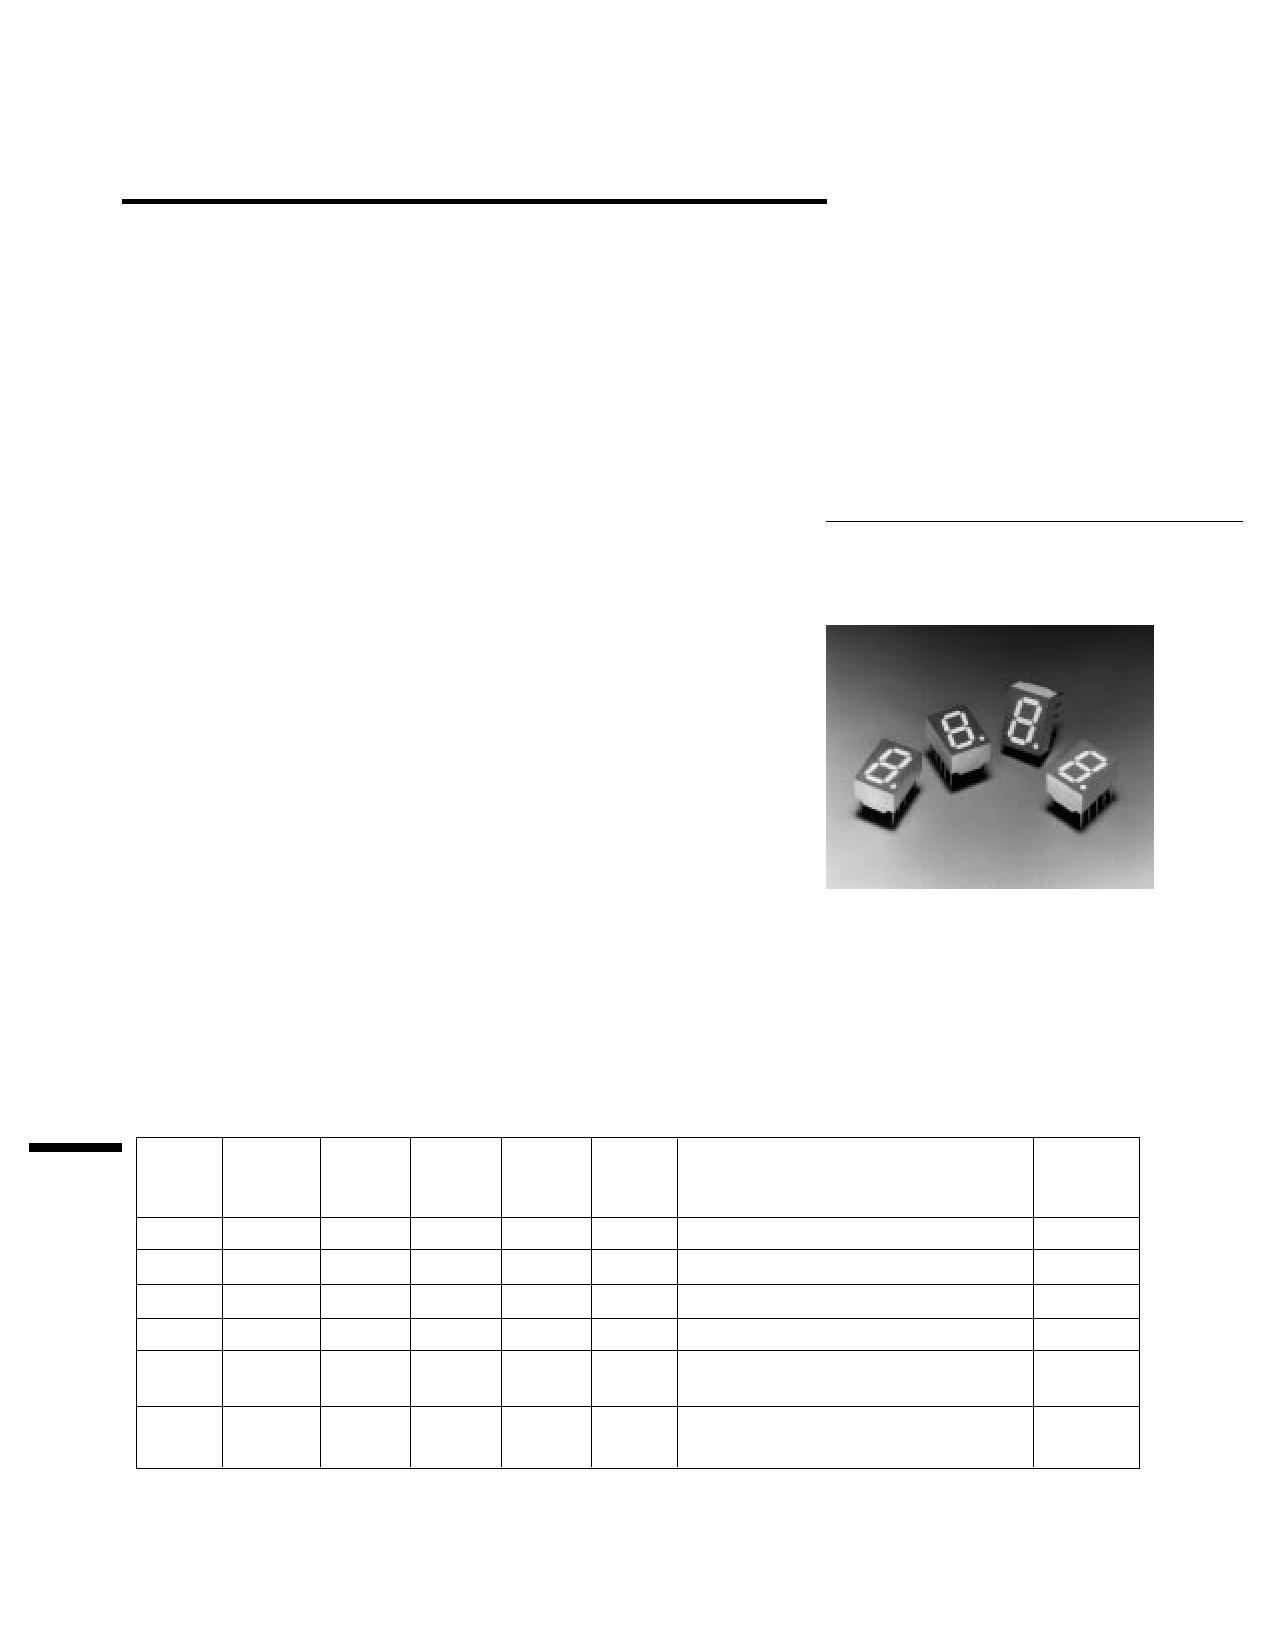 HDSP-F508 دیتاشیت PDF